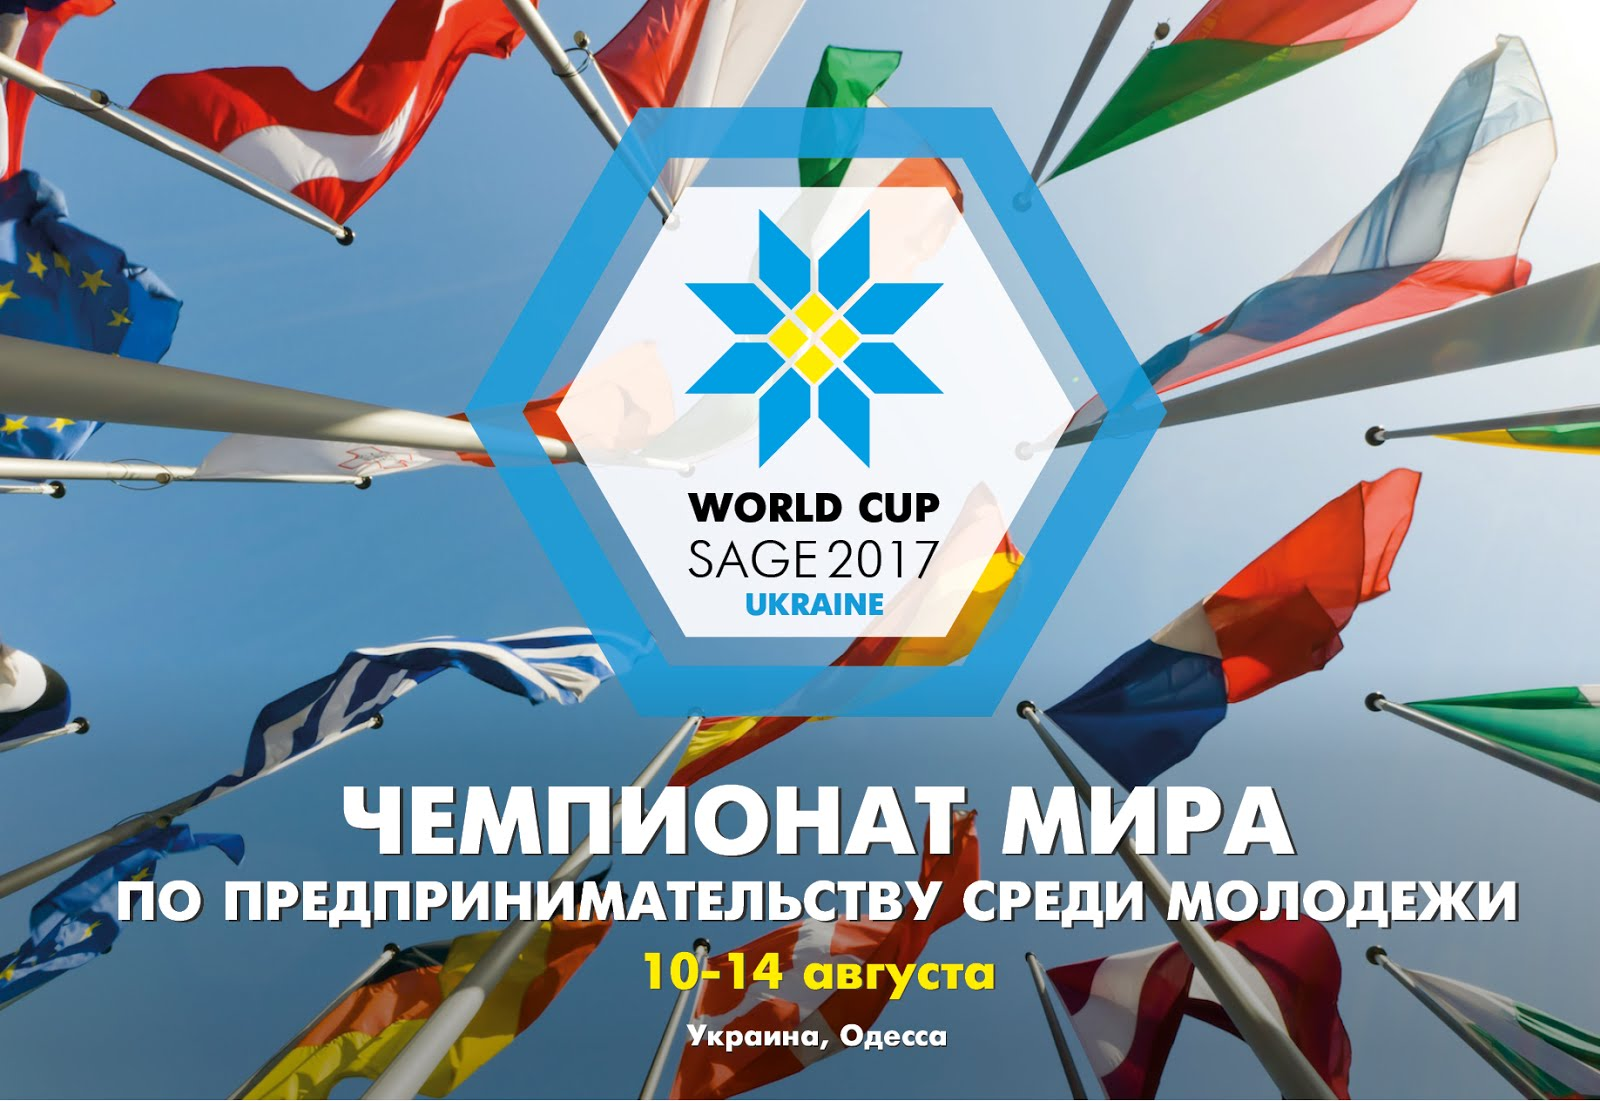 Архив WORLD CUP SAGE' 2017